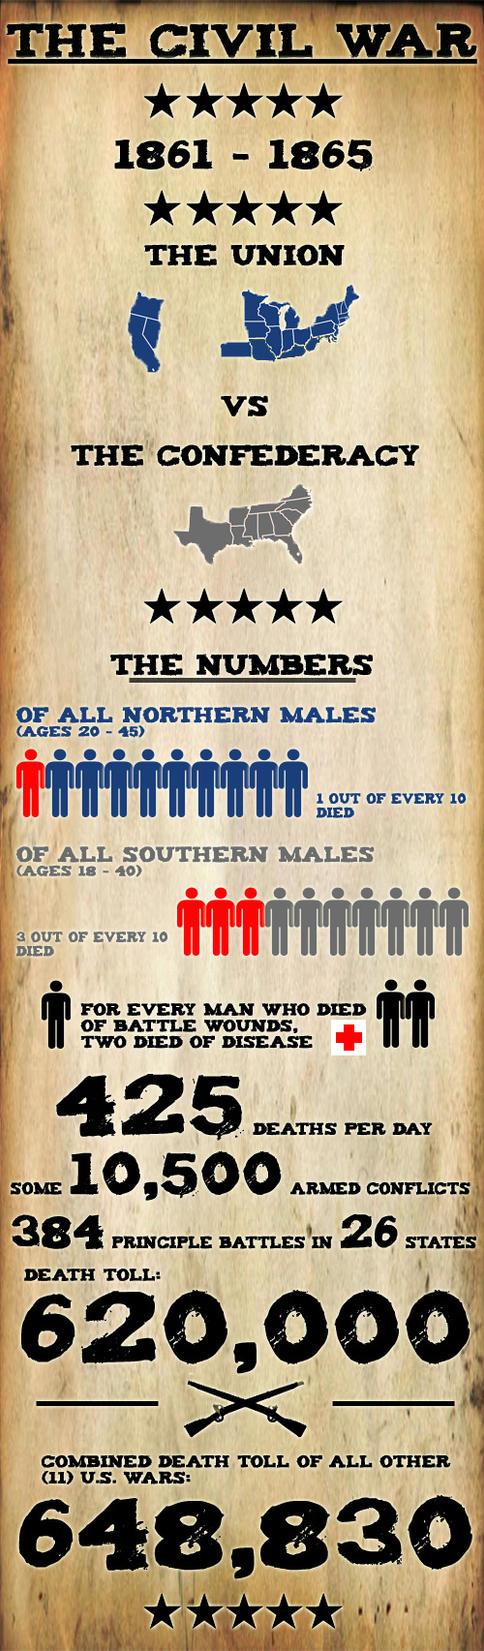 Civil War Infographic by th3thr1ll3r